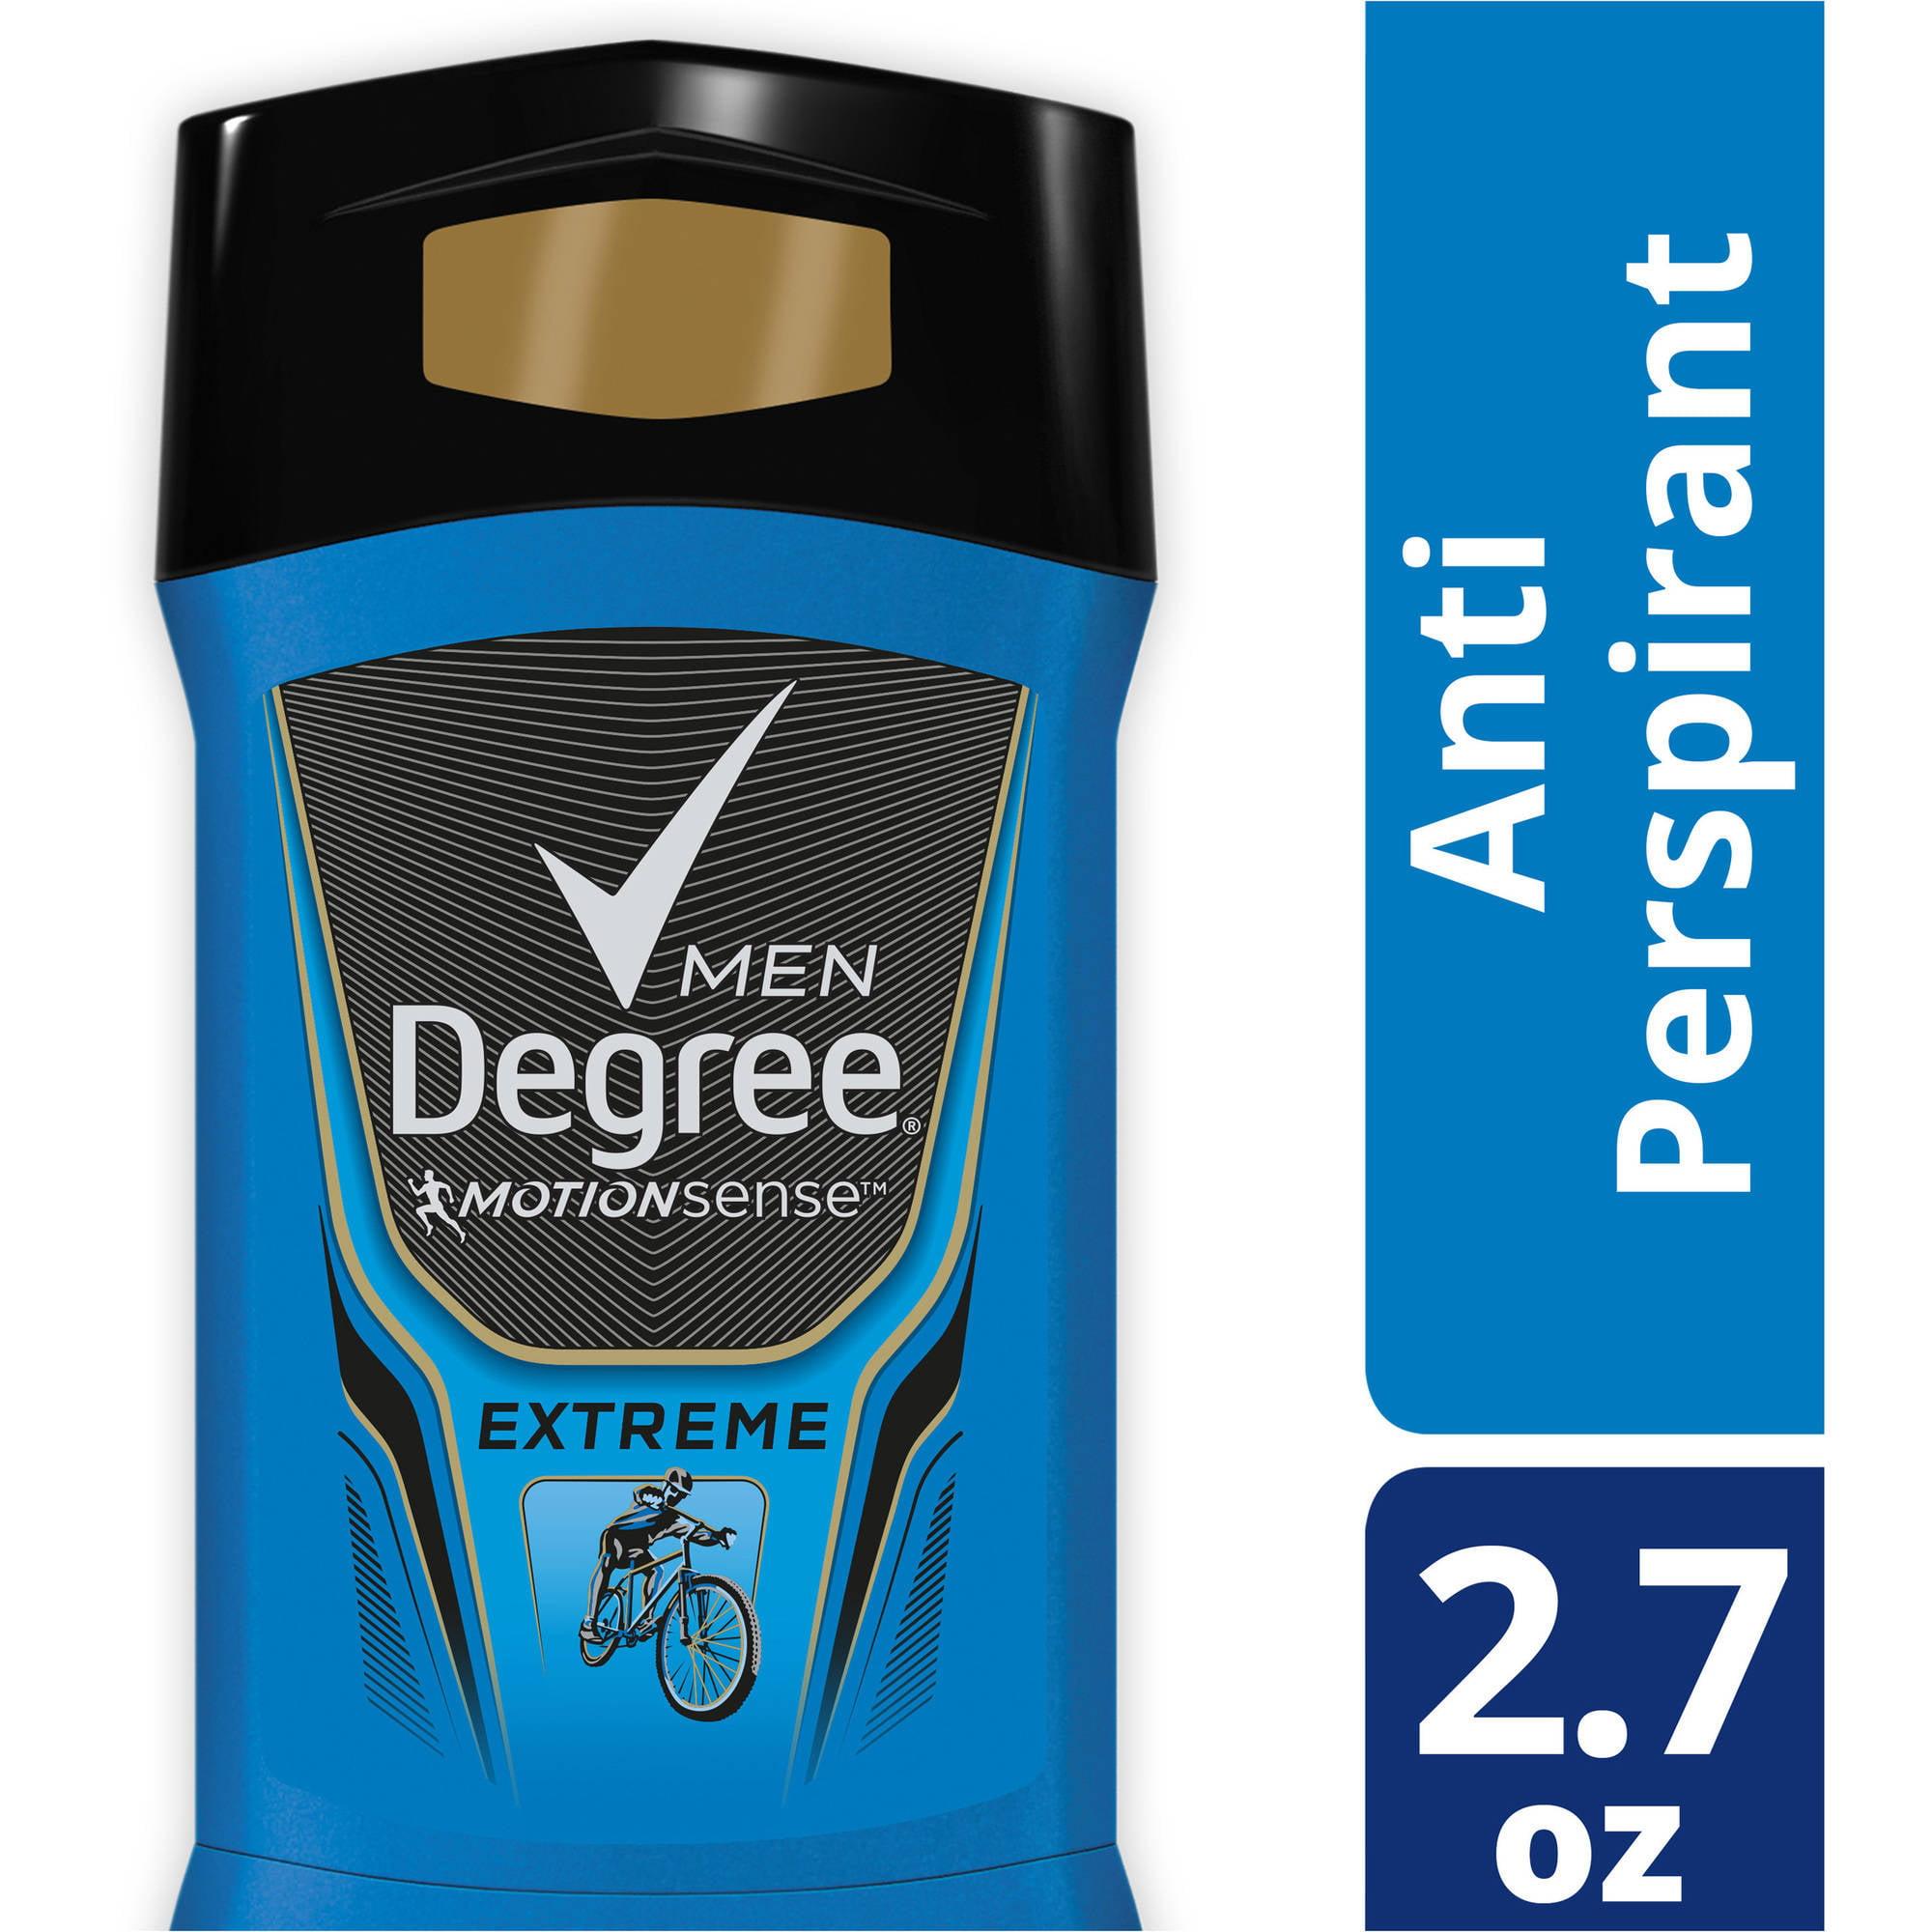 Degree Men MotionSense Extreme Antiperspirant Deodorant, 2.7 oz